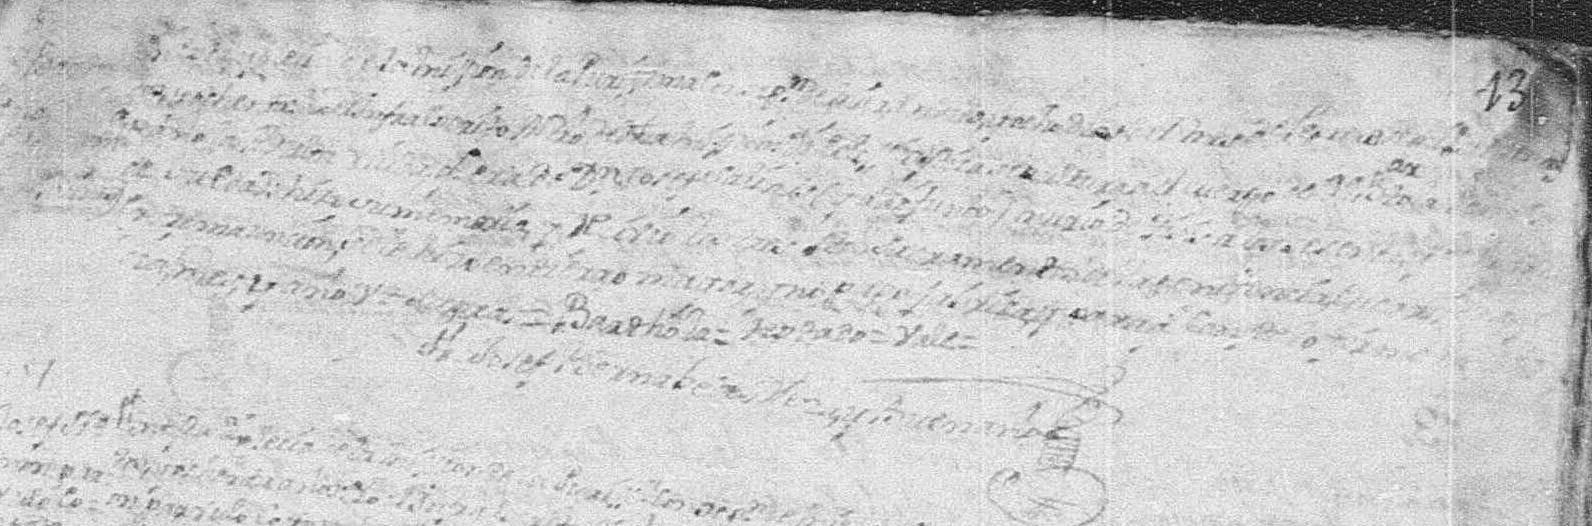 1780 Church Death Record of Maria Bartola Pena in Mier, Tamaulipas, Mexico